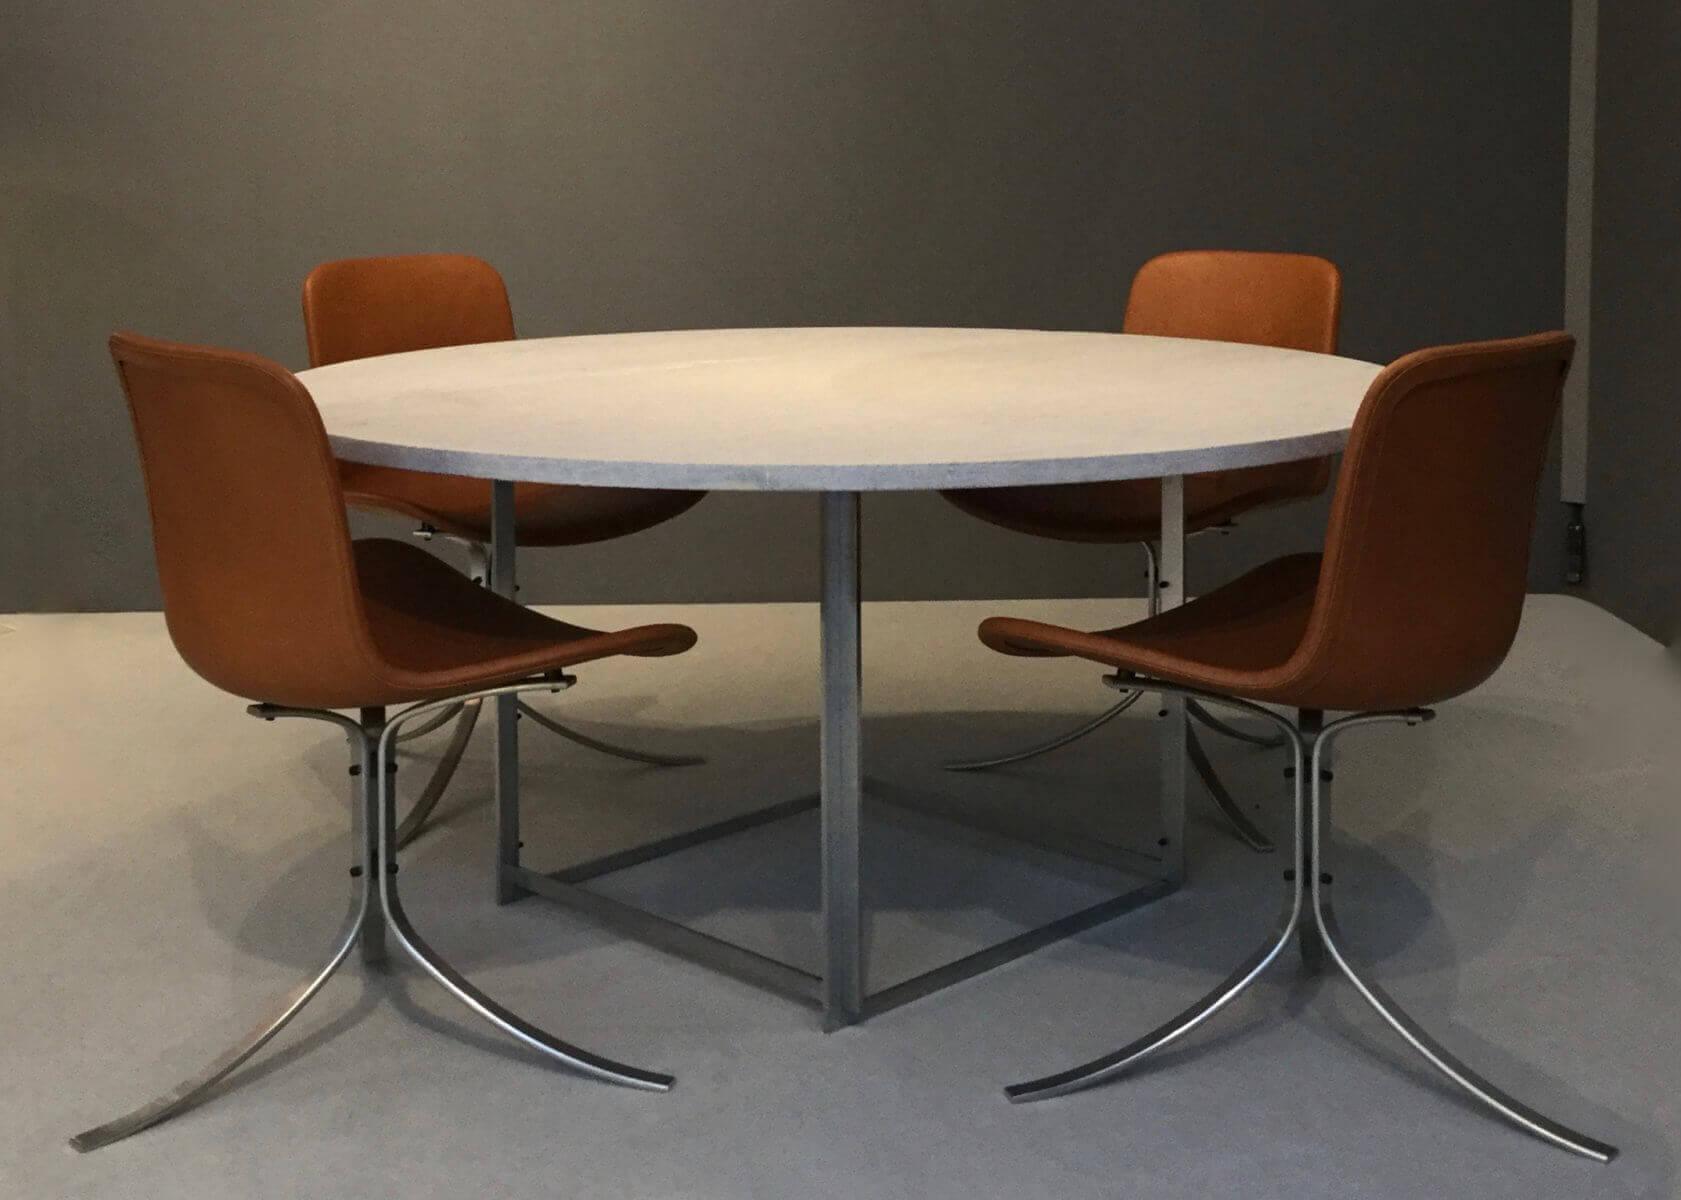 Vintage Poul Kjaerholm eetkamerset PK54 Tafel en vier PK9 stoelen